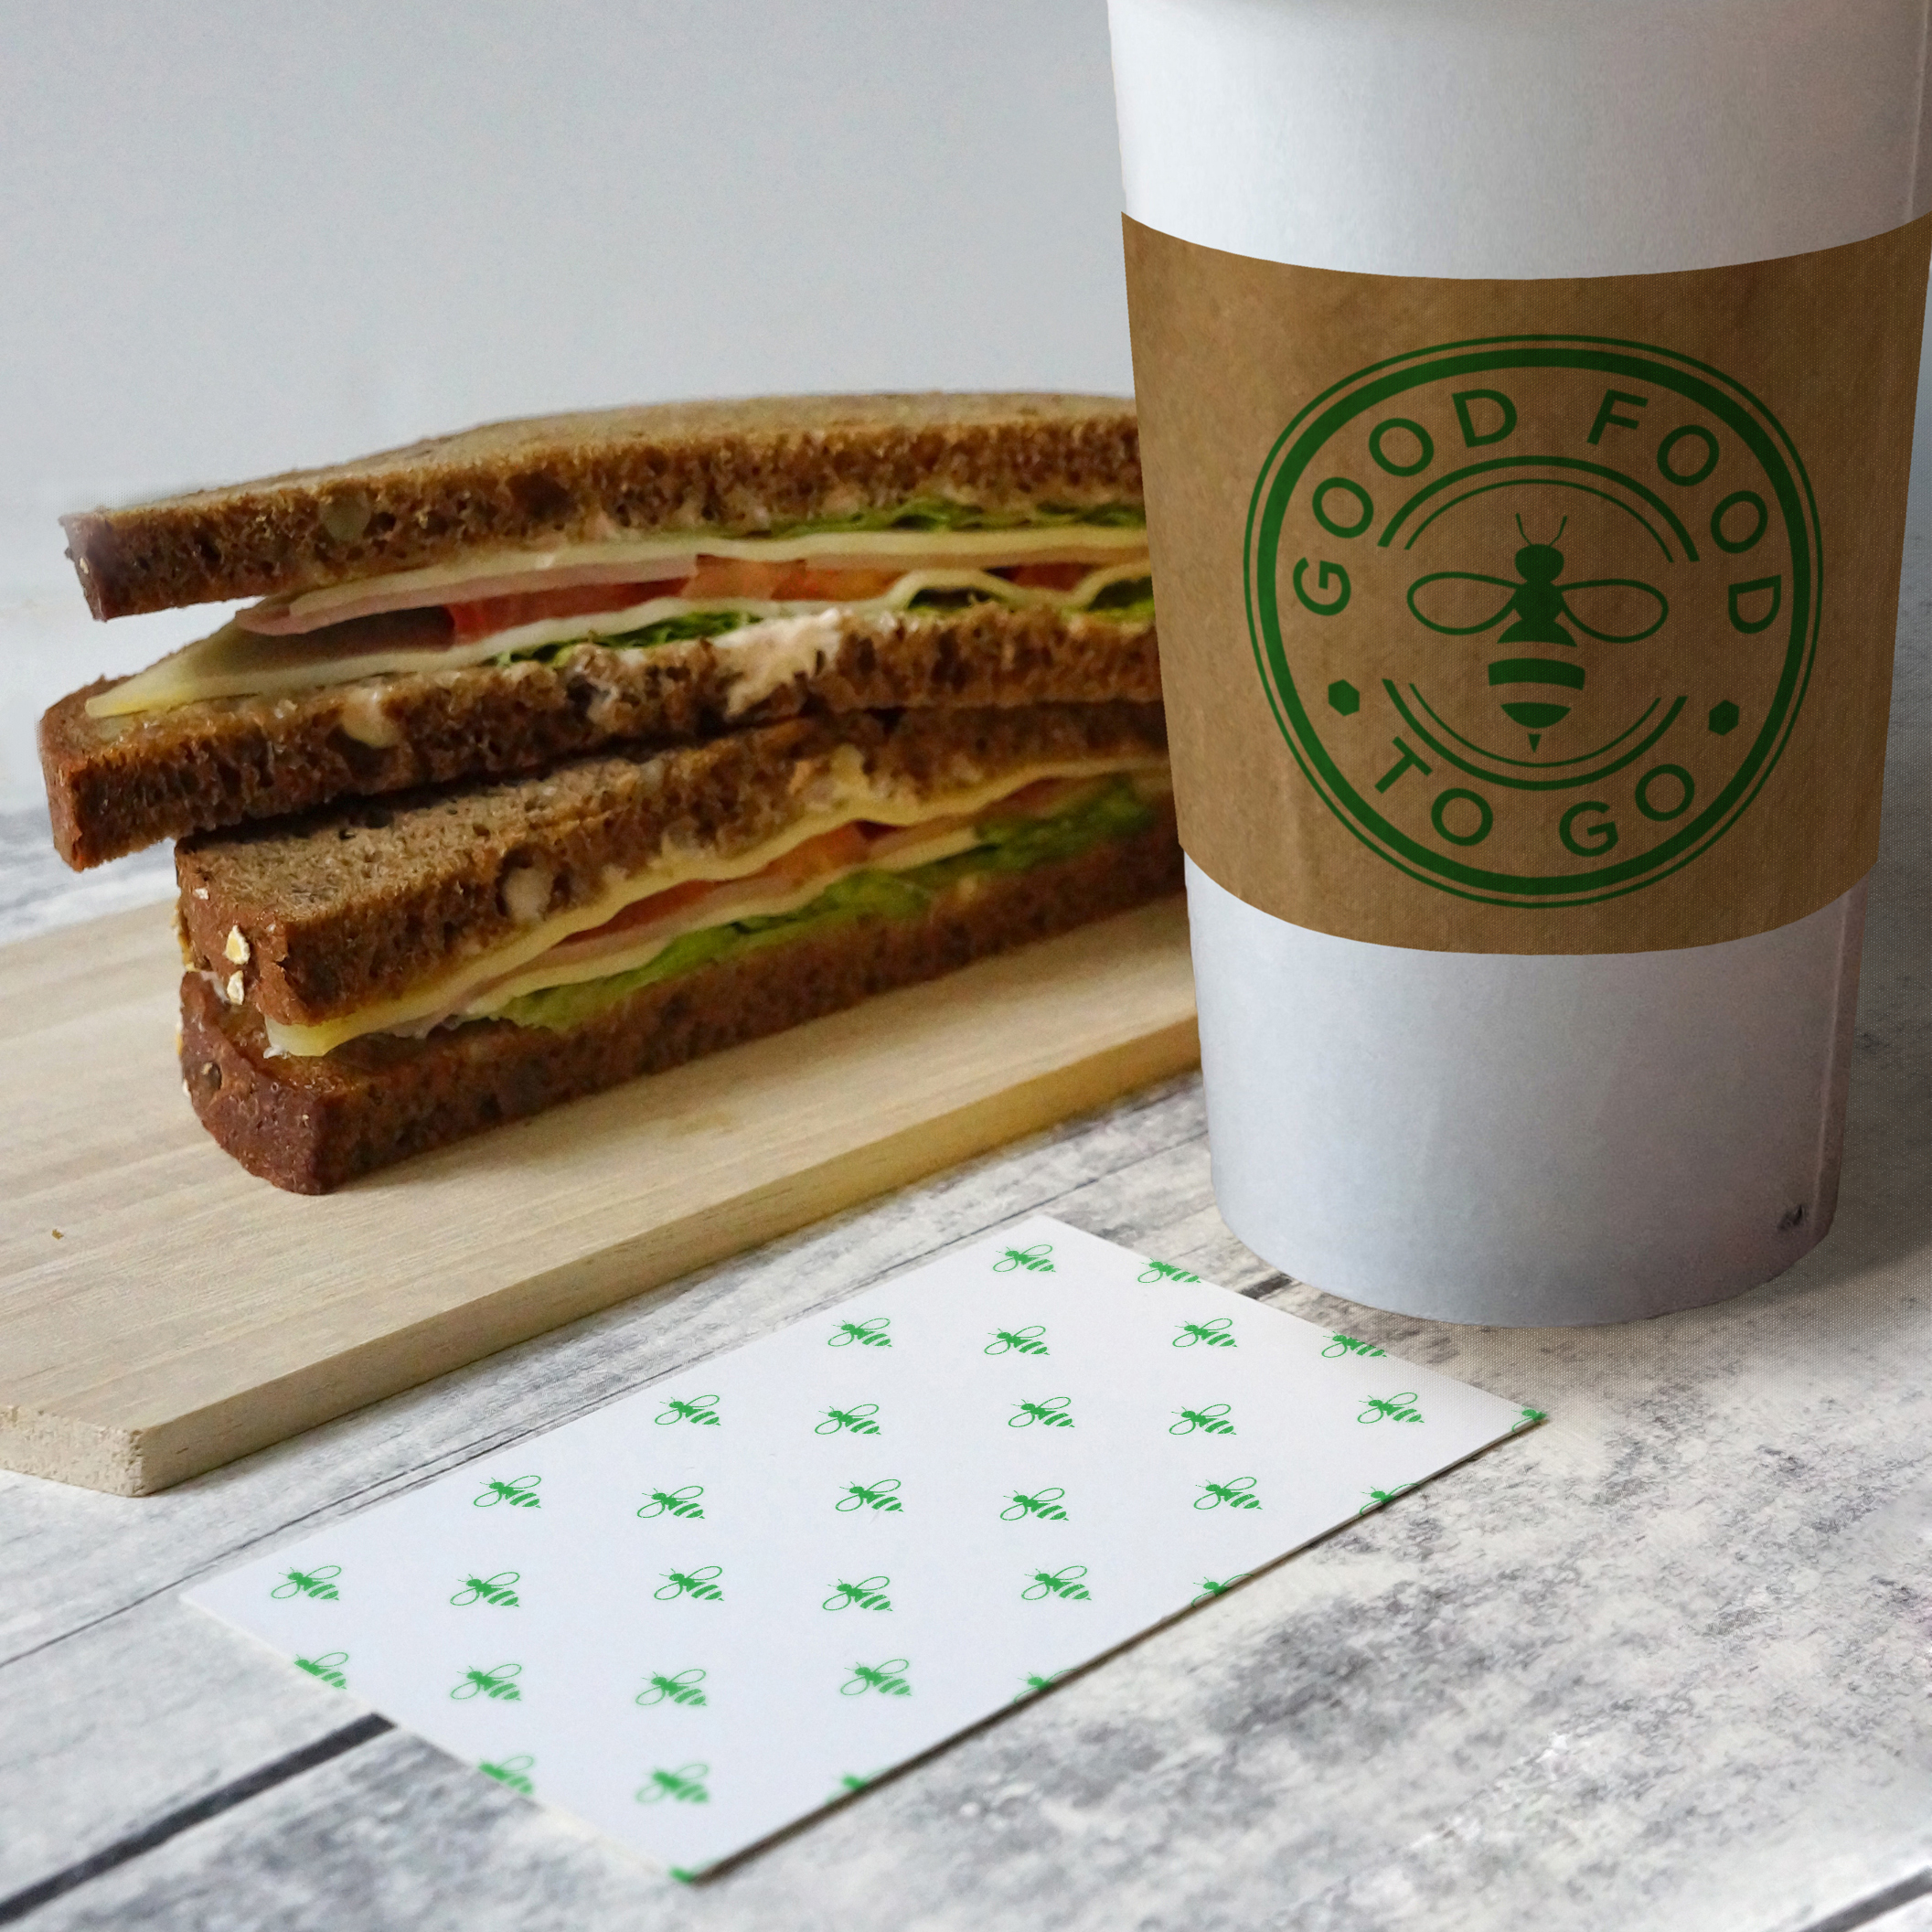 Good-Food-To-Go-Cafe-branding-logo-design-coffee-sandwich.jpg